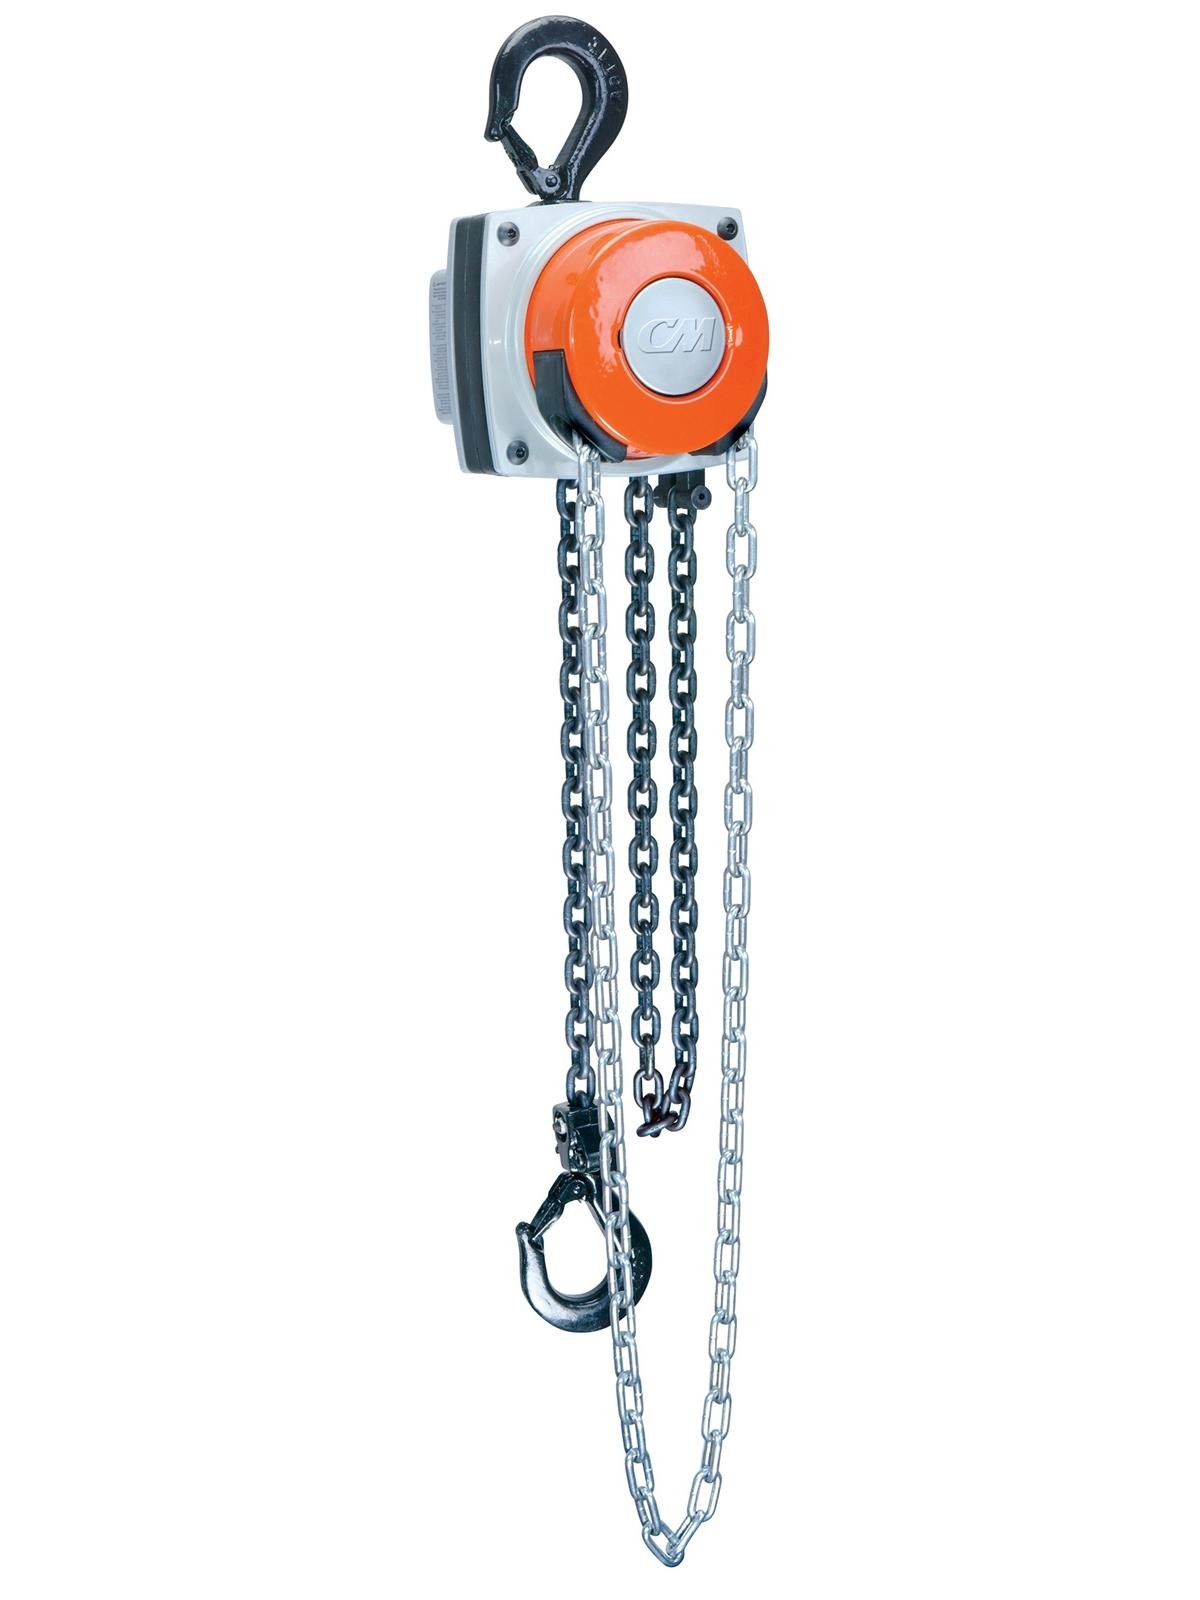 CM - HURRICANE 360 1/2 Ton Hand Chain Hoist 10' Lift 8' Handchain Drop